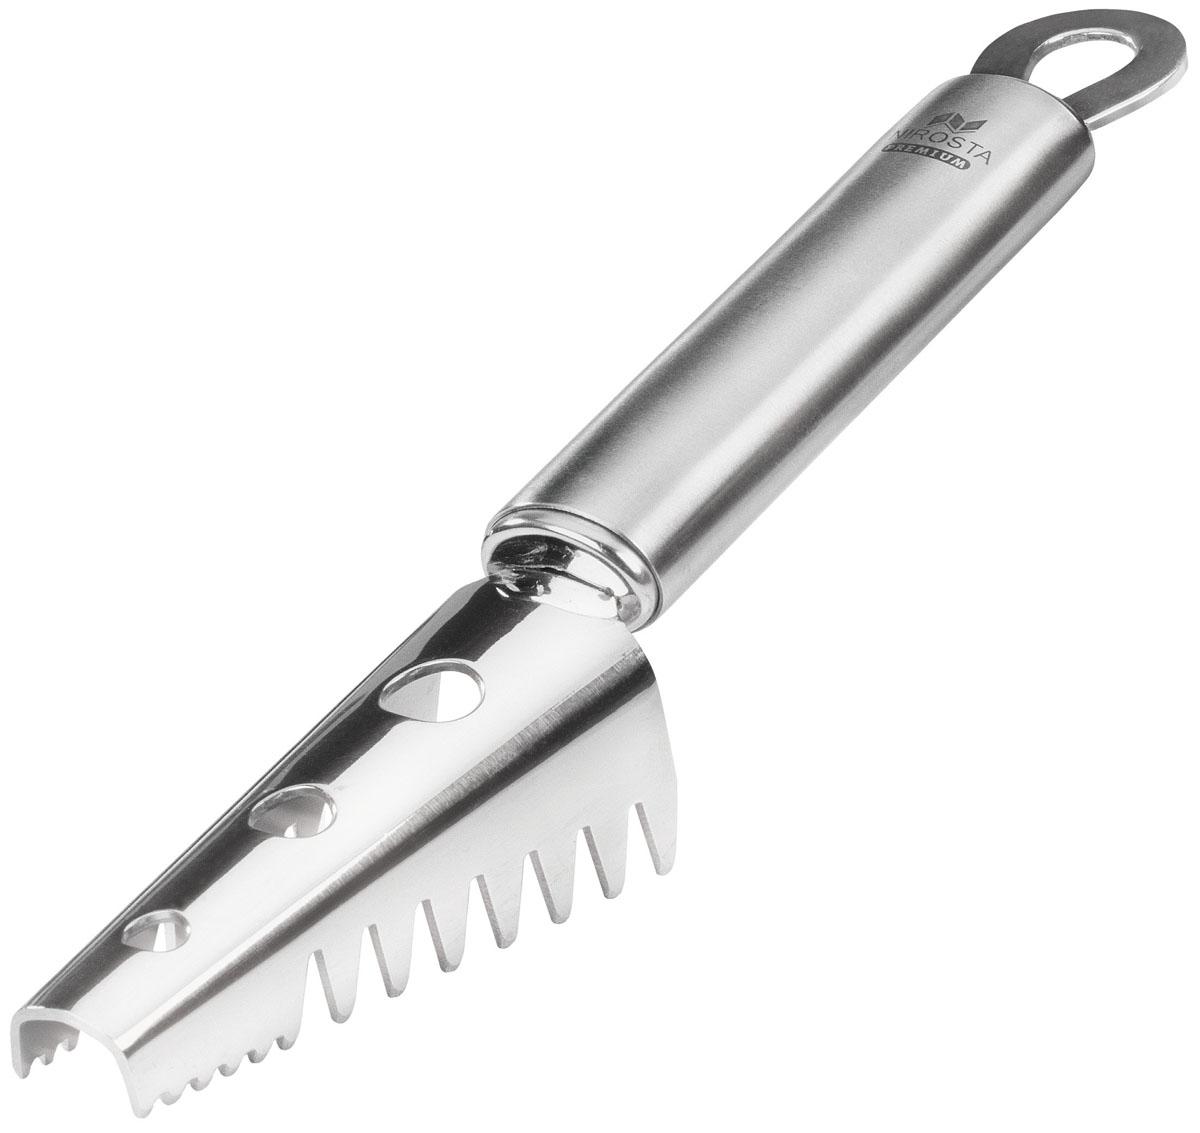 Нож для чистки рыбы Fackelmann Nirosta, длина 20 см цена